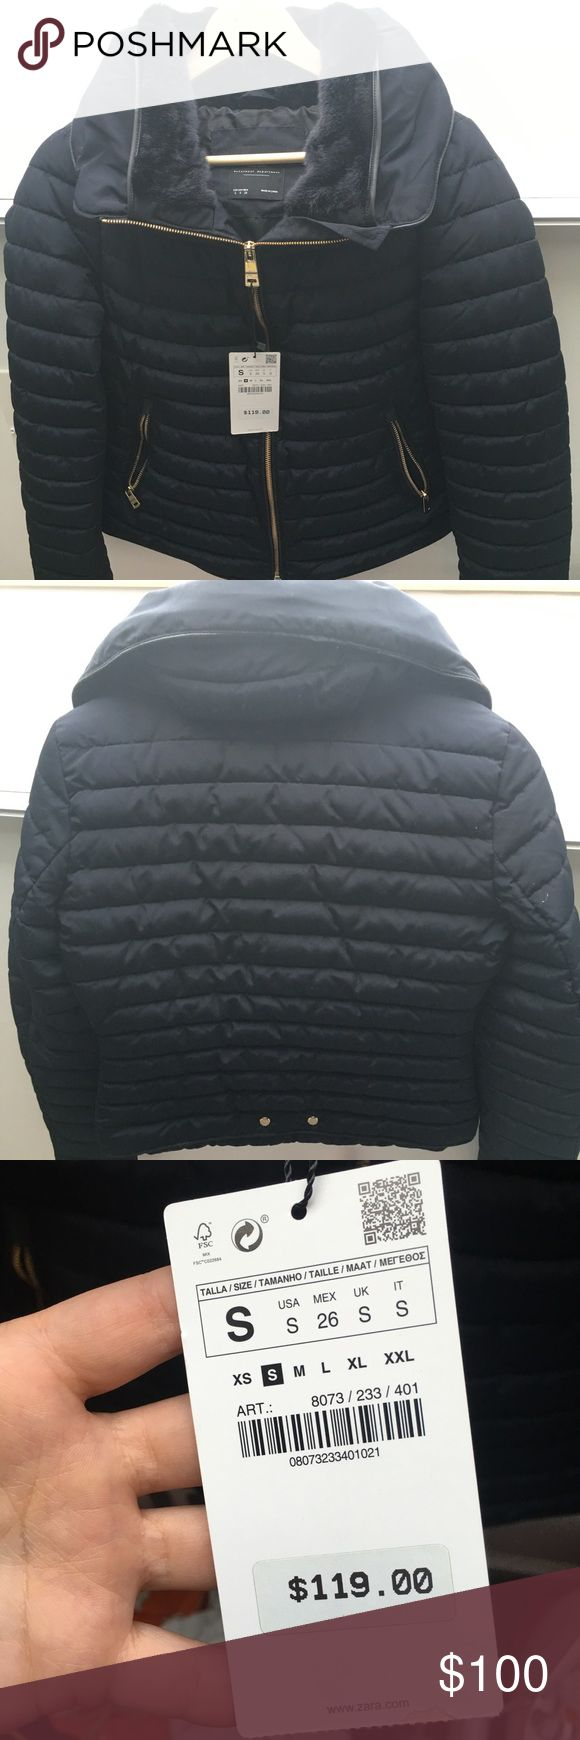 Zara Basic Jacket BRAND NEW Navy Blue Zara Jacket! Zara Jackets & Coats Puffers